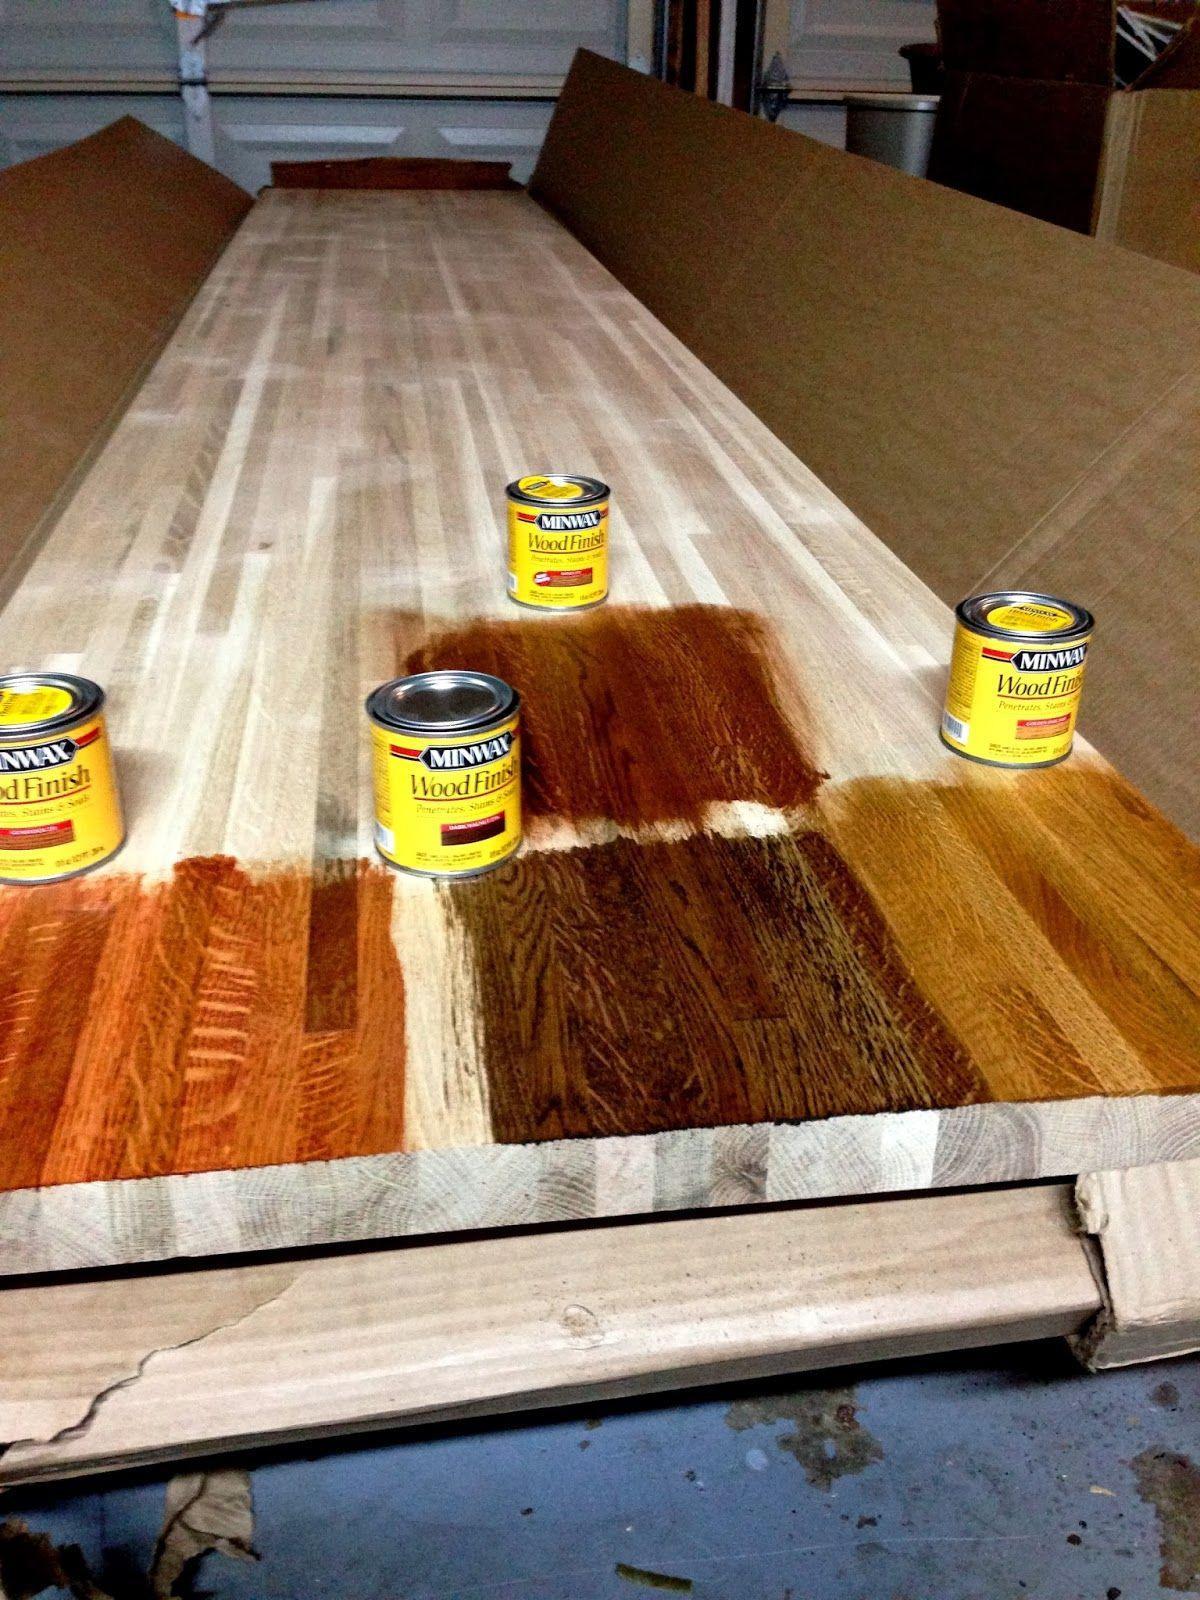 staining hardwood floors darker of diy wood stain colors inspirational diy kitchen remodel staining for diy wood stain colors inspirational diy kitchen remodel staining butcher block countertops